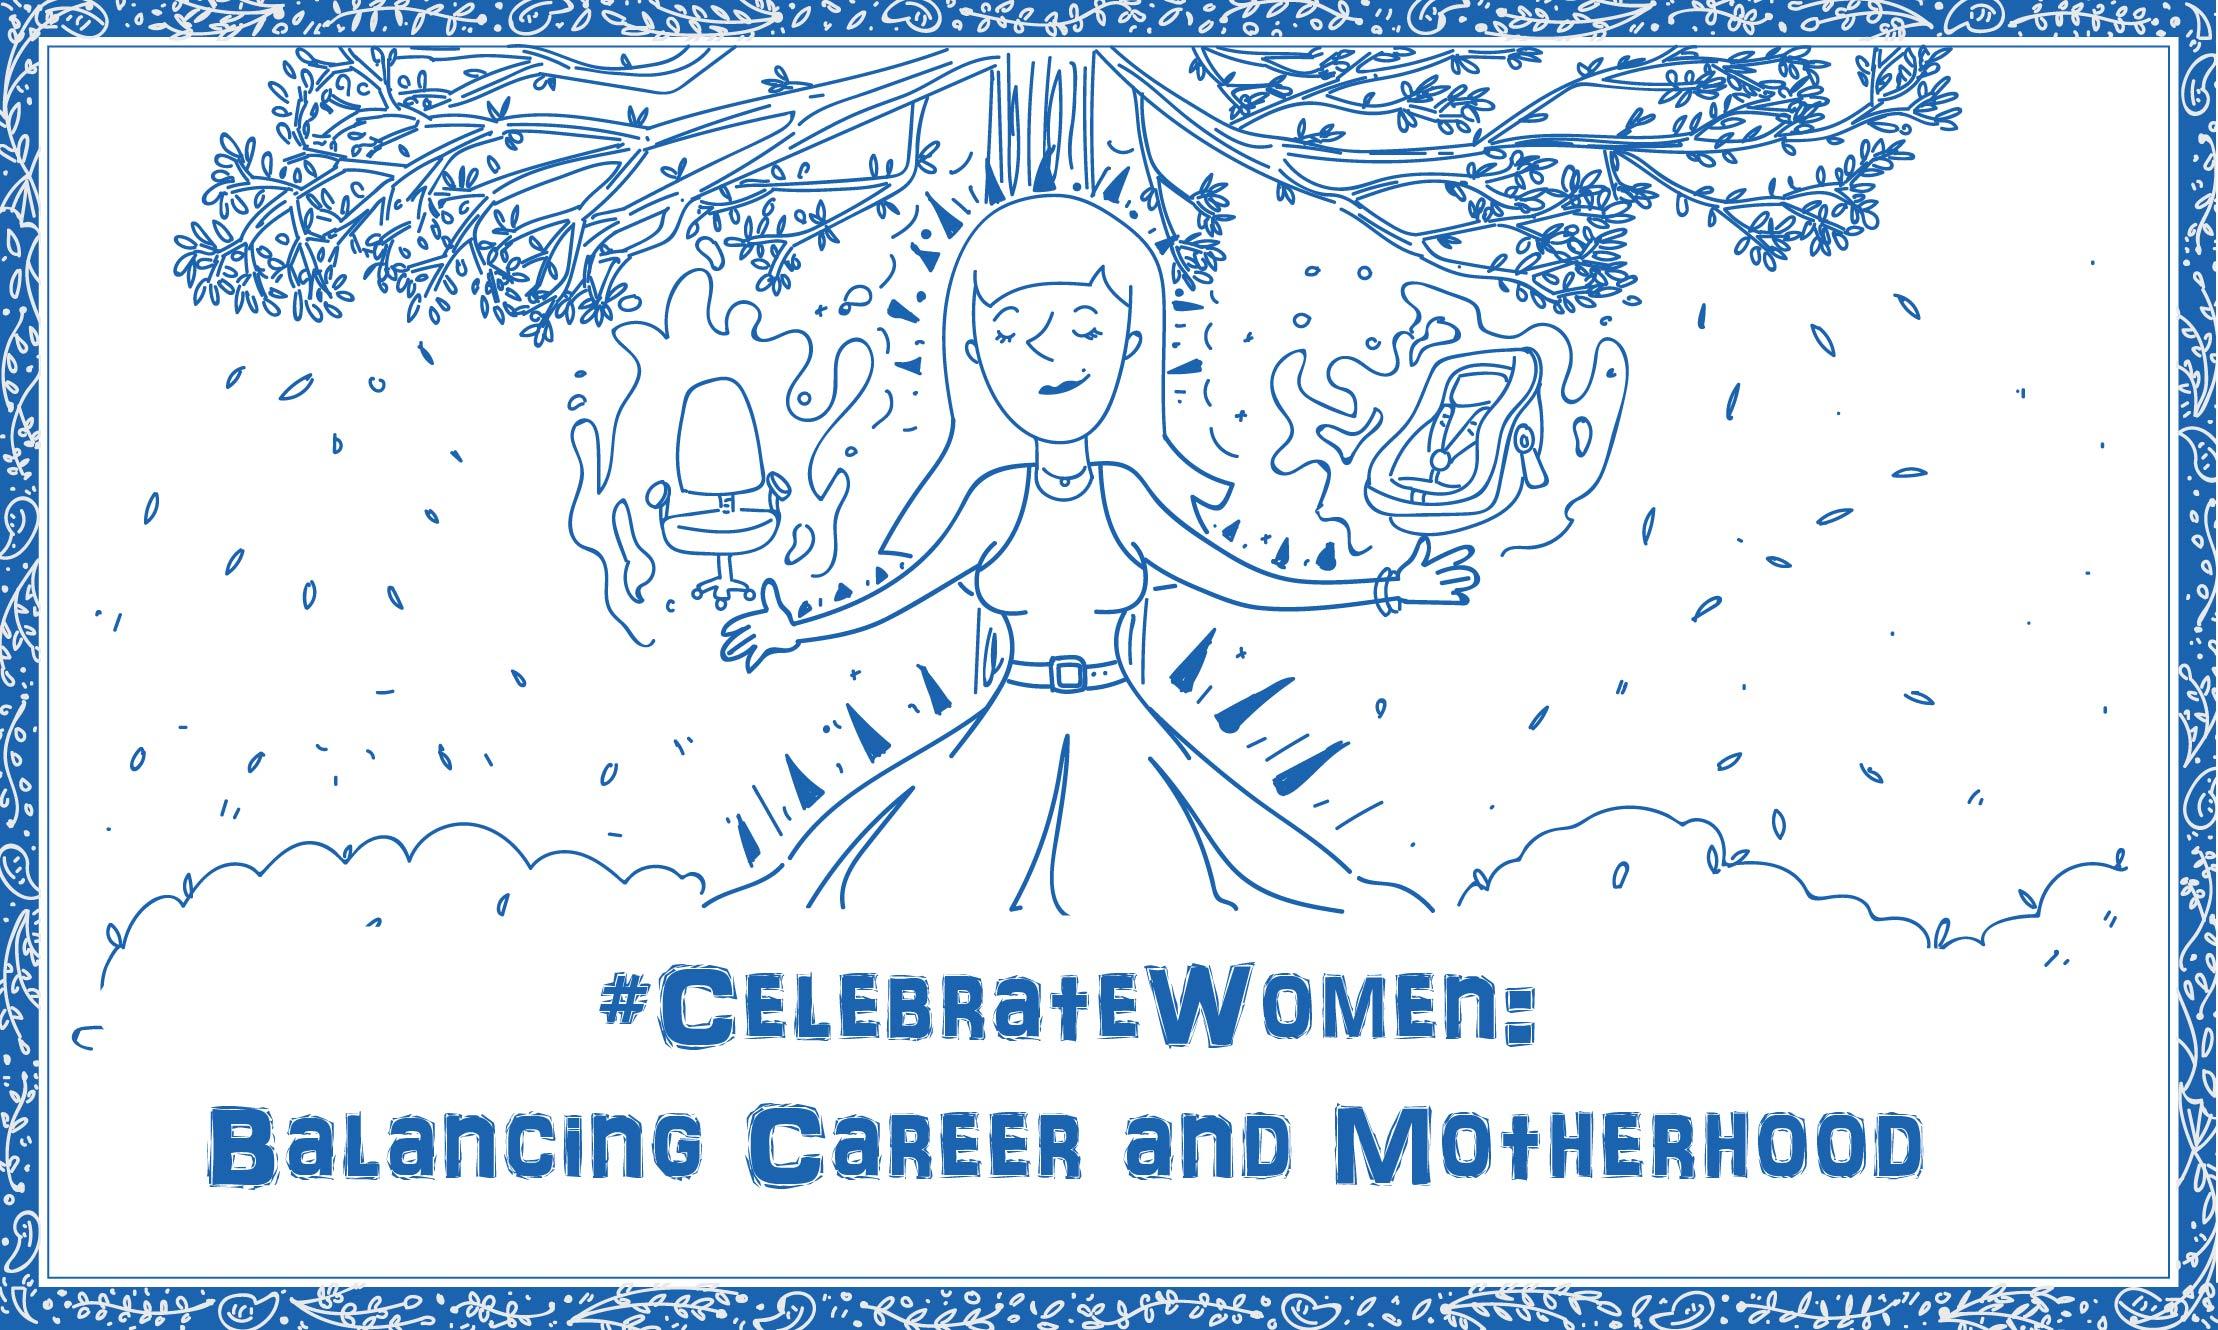 #CelebrateWomen: Balancing Career and Motherhood